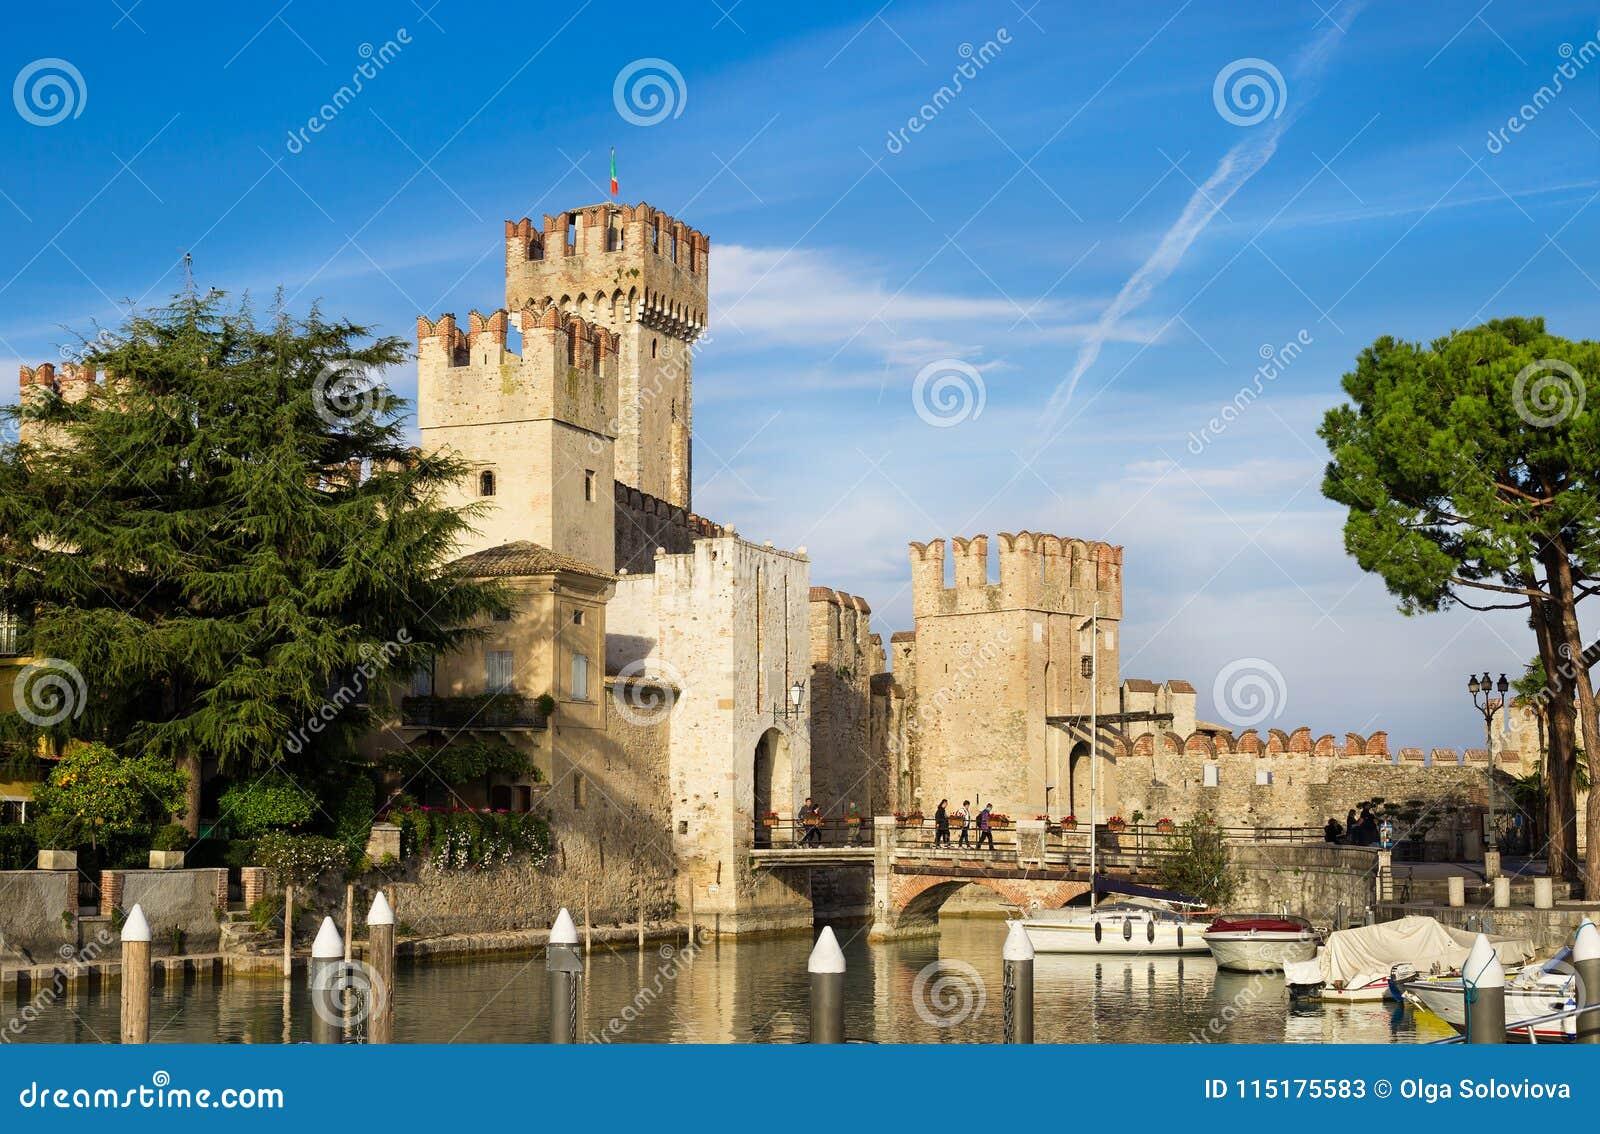 Rocca Scaligera castle in Sirmione near Garda Lake